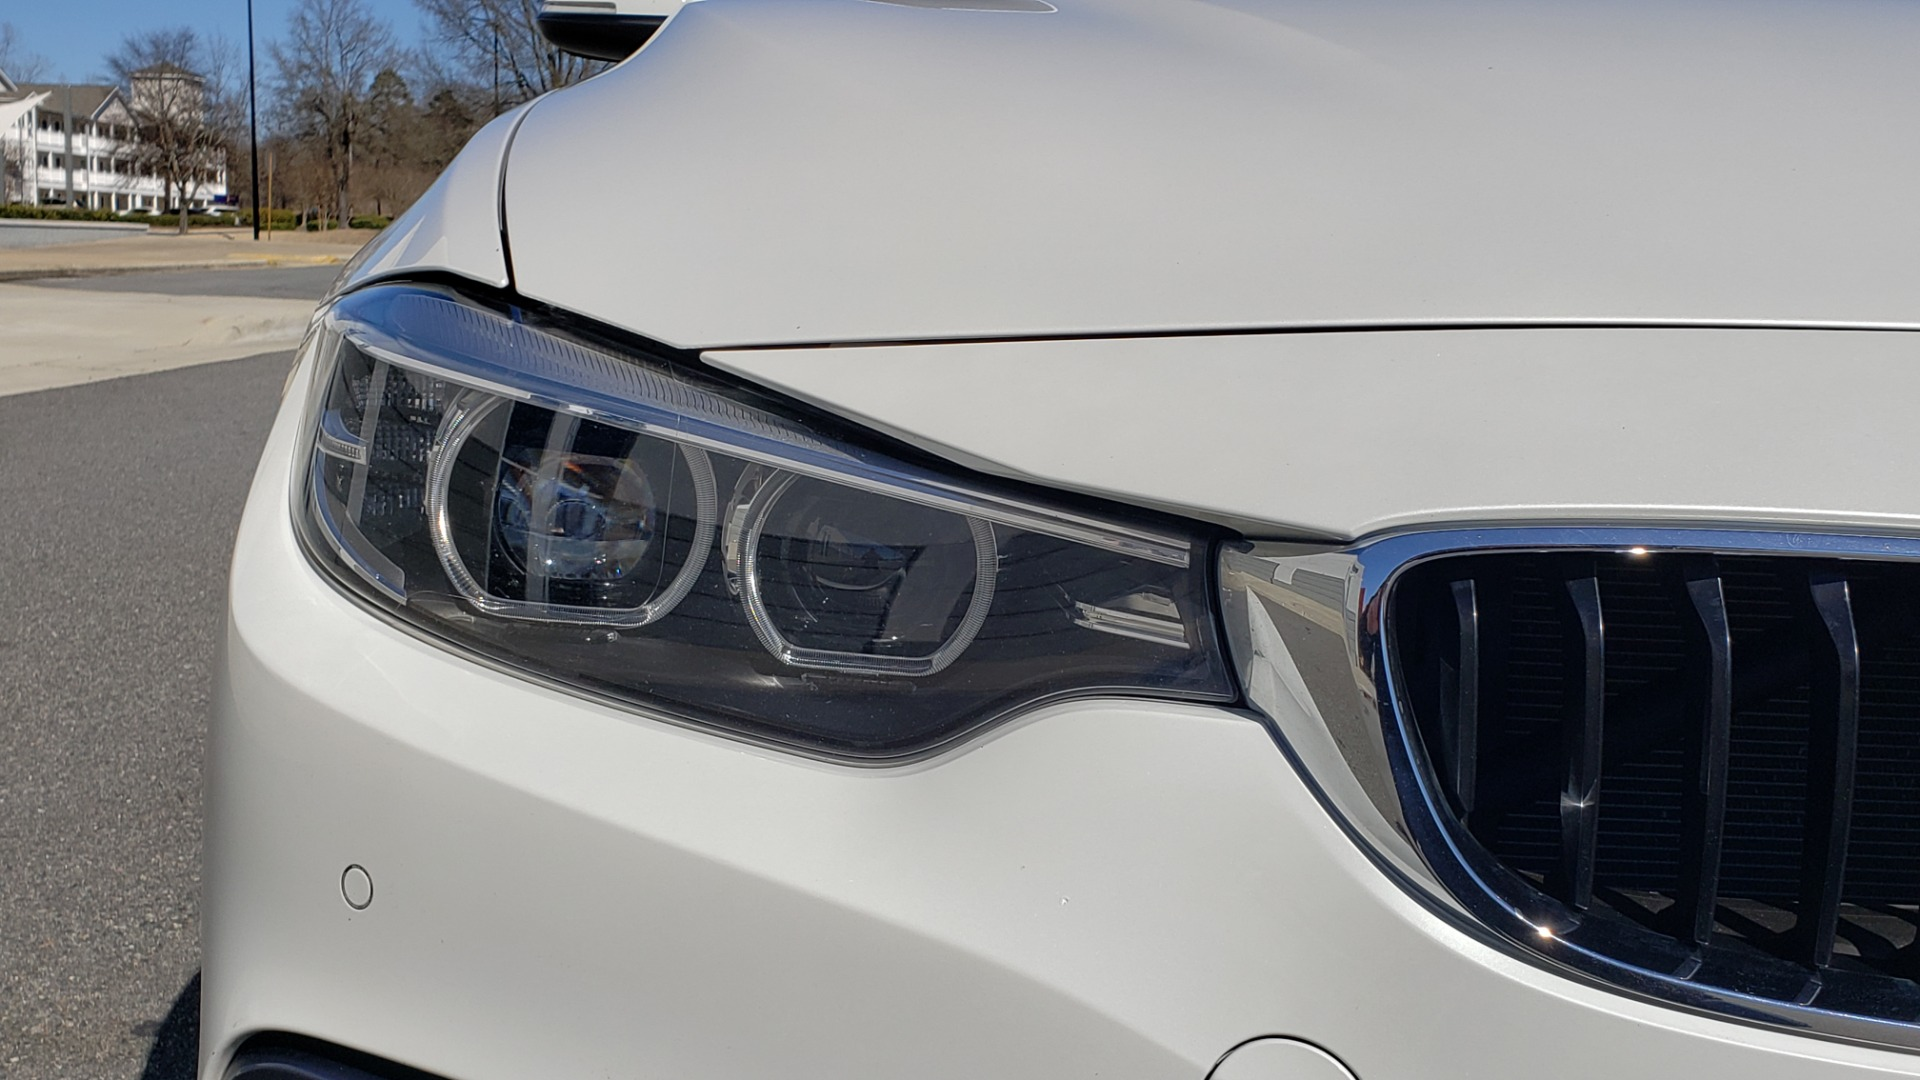 Used 2018 BMW 4 SERIES 430IXDRIVE / PREMIUM / NAV / SUNROOF / ESSENTIALS PKG for sale $27,795 at Formula Imports in Charlotte NC 28227 28